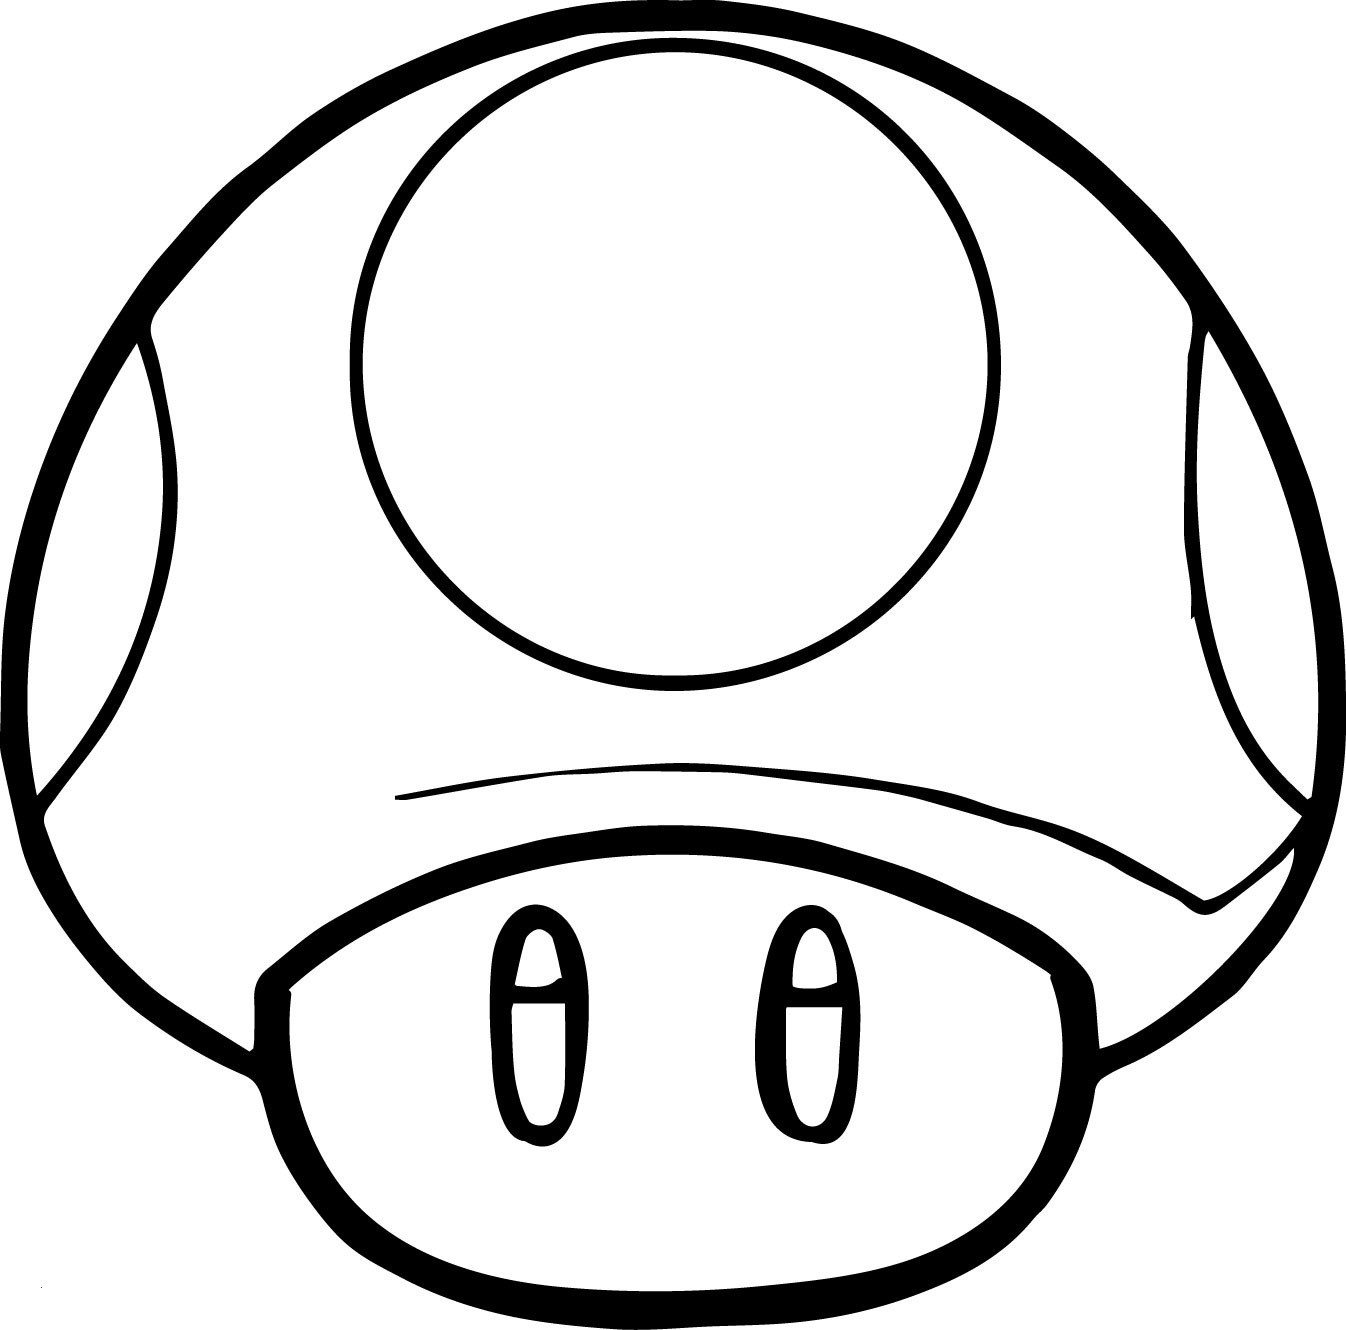 Ausmalbild Super Mario Frisch Super Mario Coloring Pages Awesome Ausgezeichnet Super Mario Pilz Stock